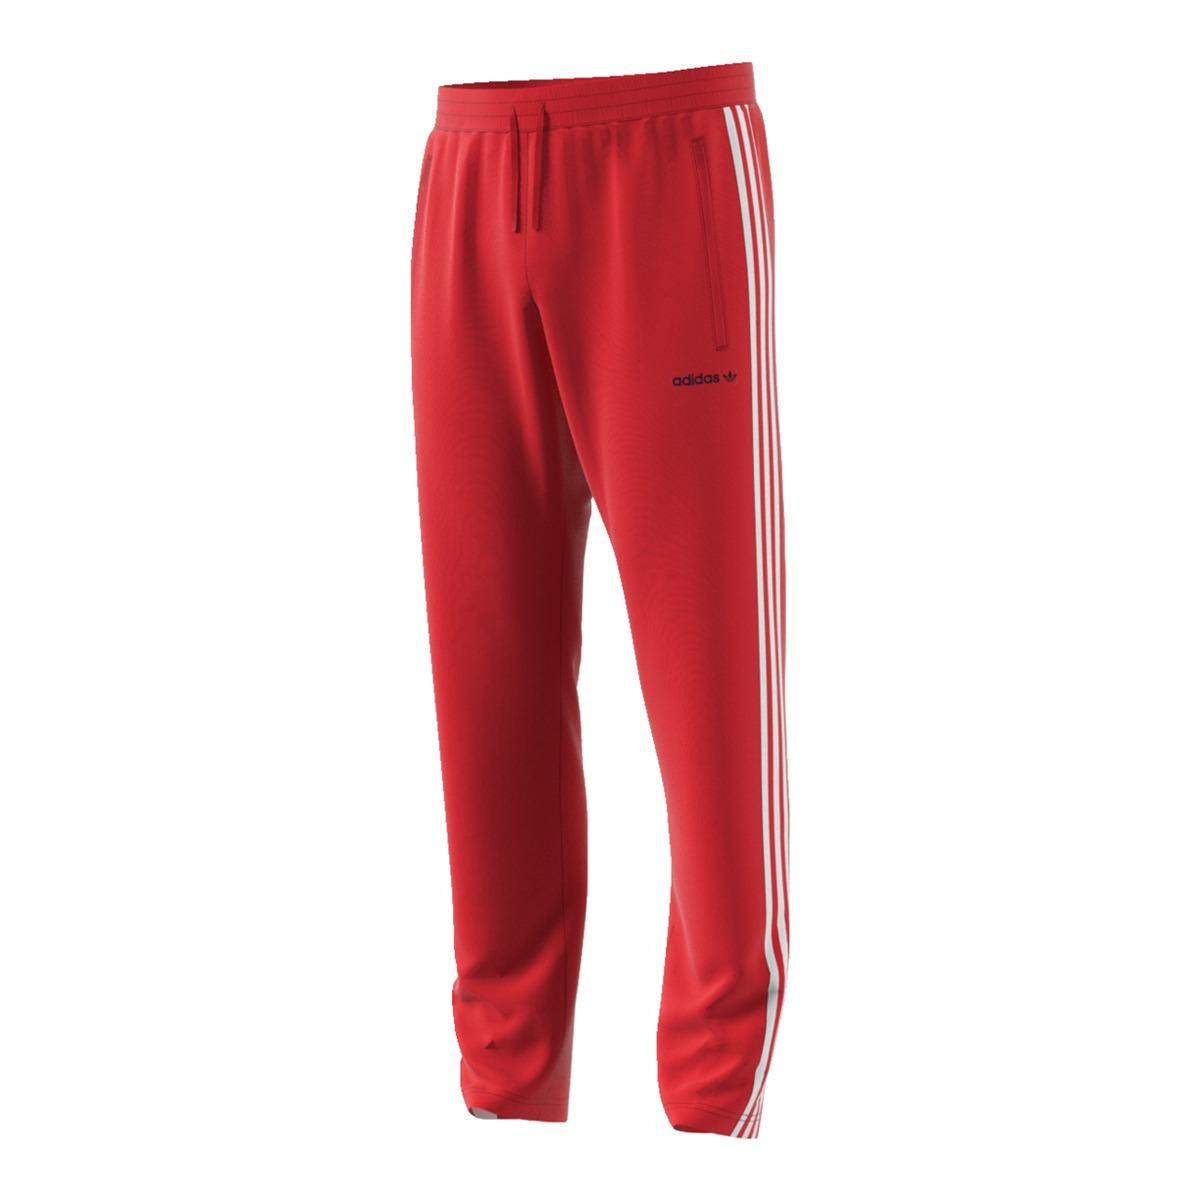 Hombre 070 Moda Tp 1 Adidas Block Original Pantalon Tapere Rjbl wvzfYn